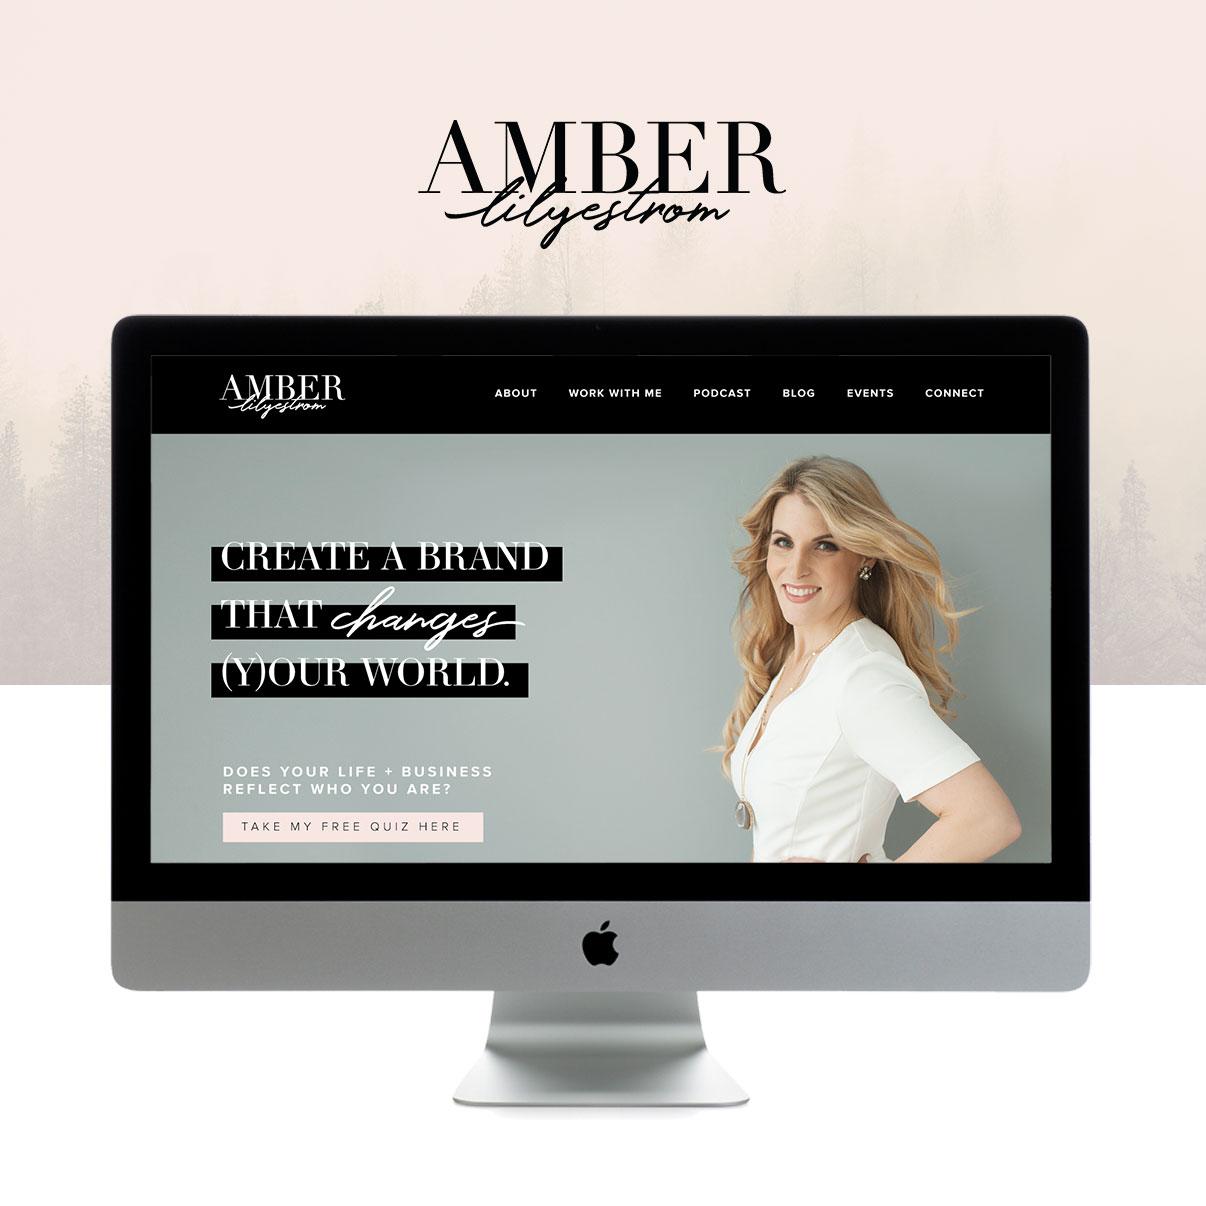 AmberLilyestrom_websitelaunchtemplate2